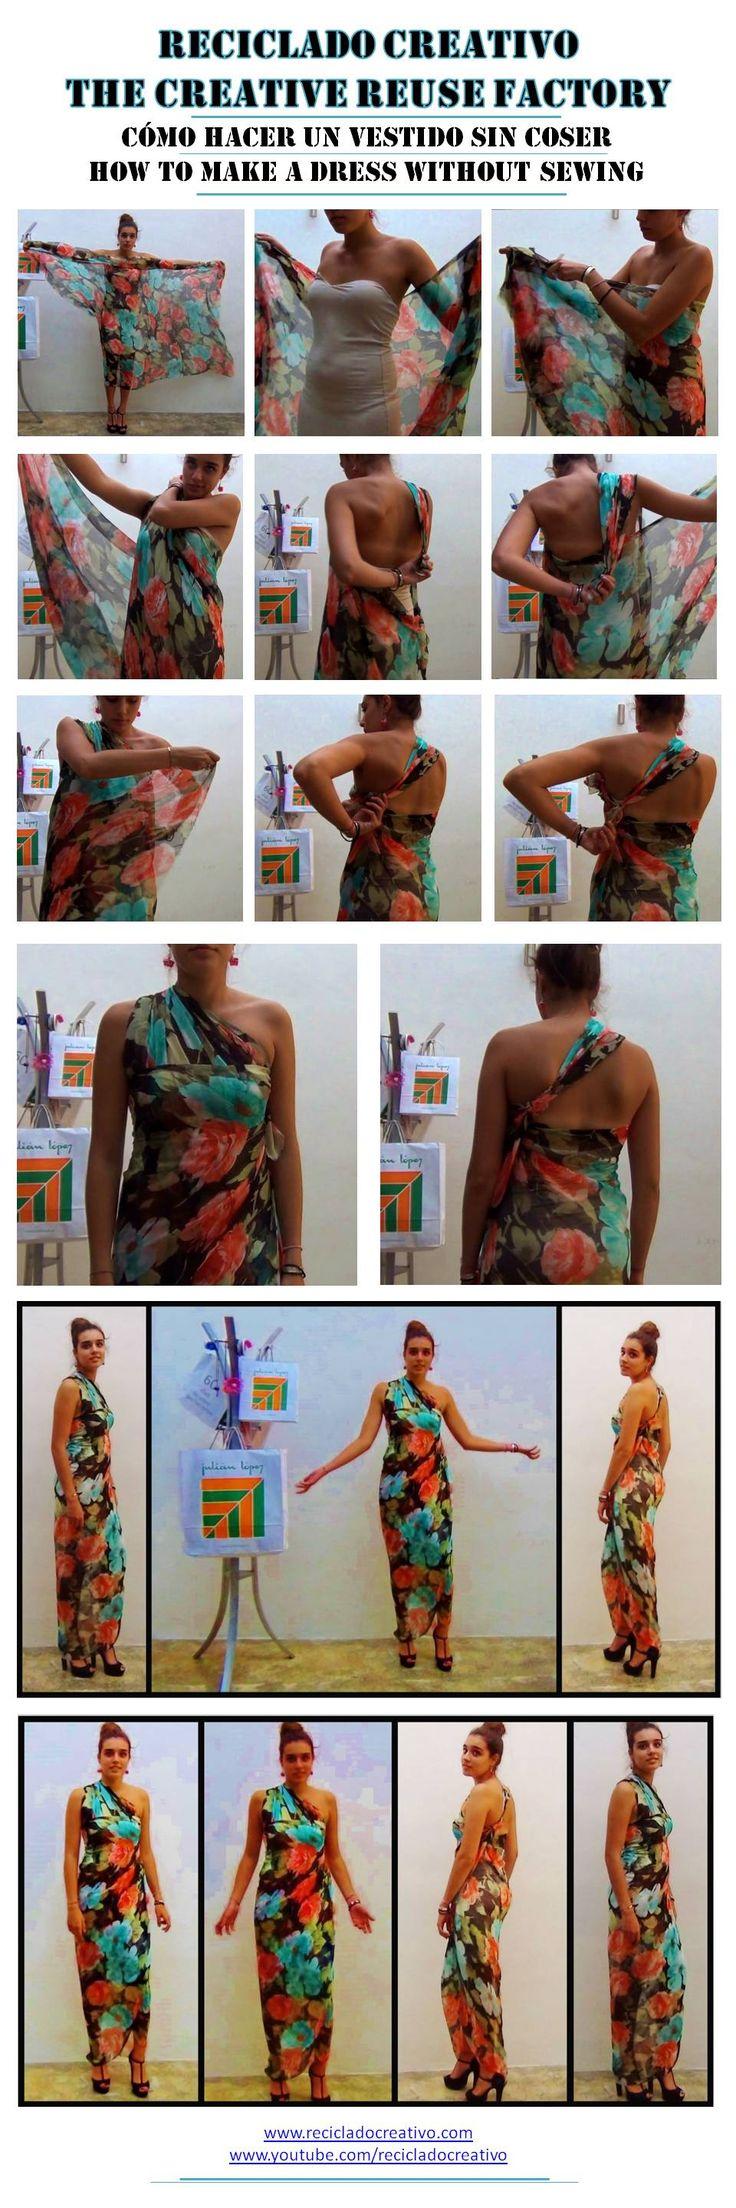 Cómo realizar un vestido de seda sin coser - How to make a silk dress stitch free https://youtu.be/KgLpBtmsAd8?list=PLemyWmGdwuSOadr85AUSy7Fvvt26iKvWo